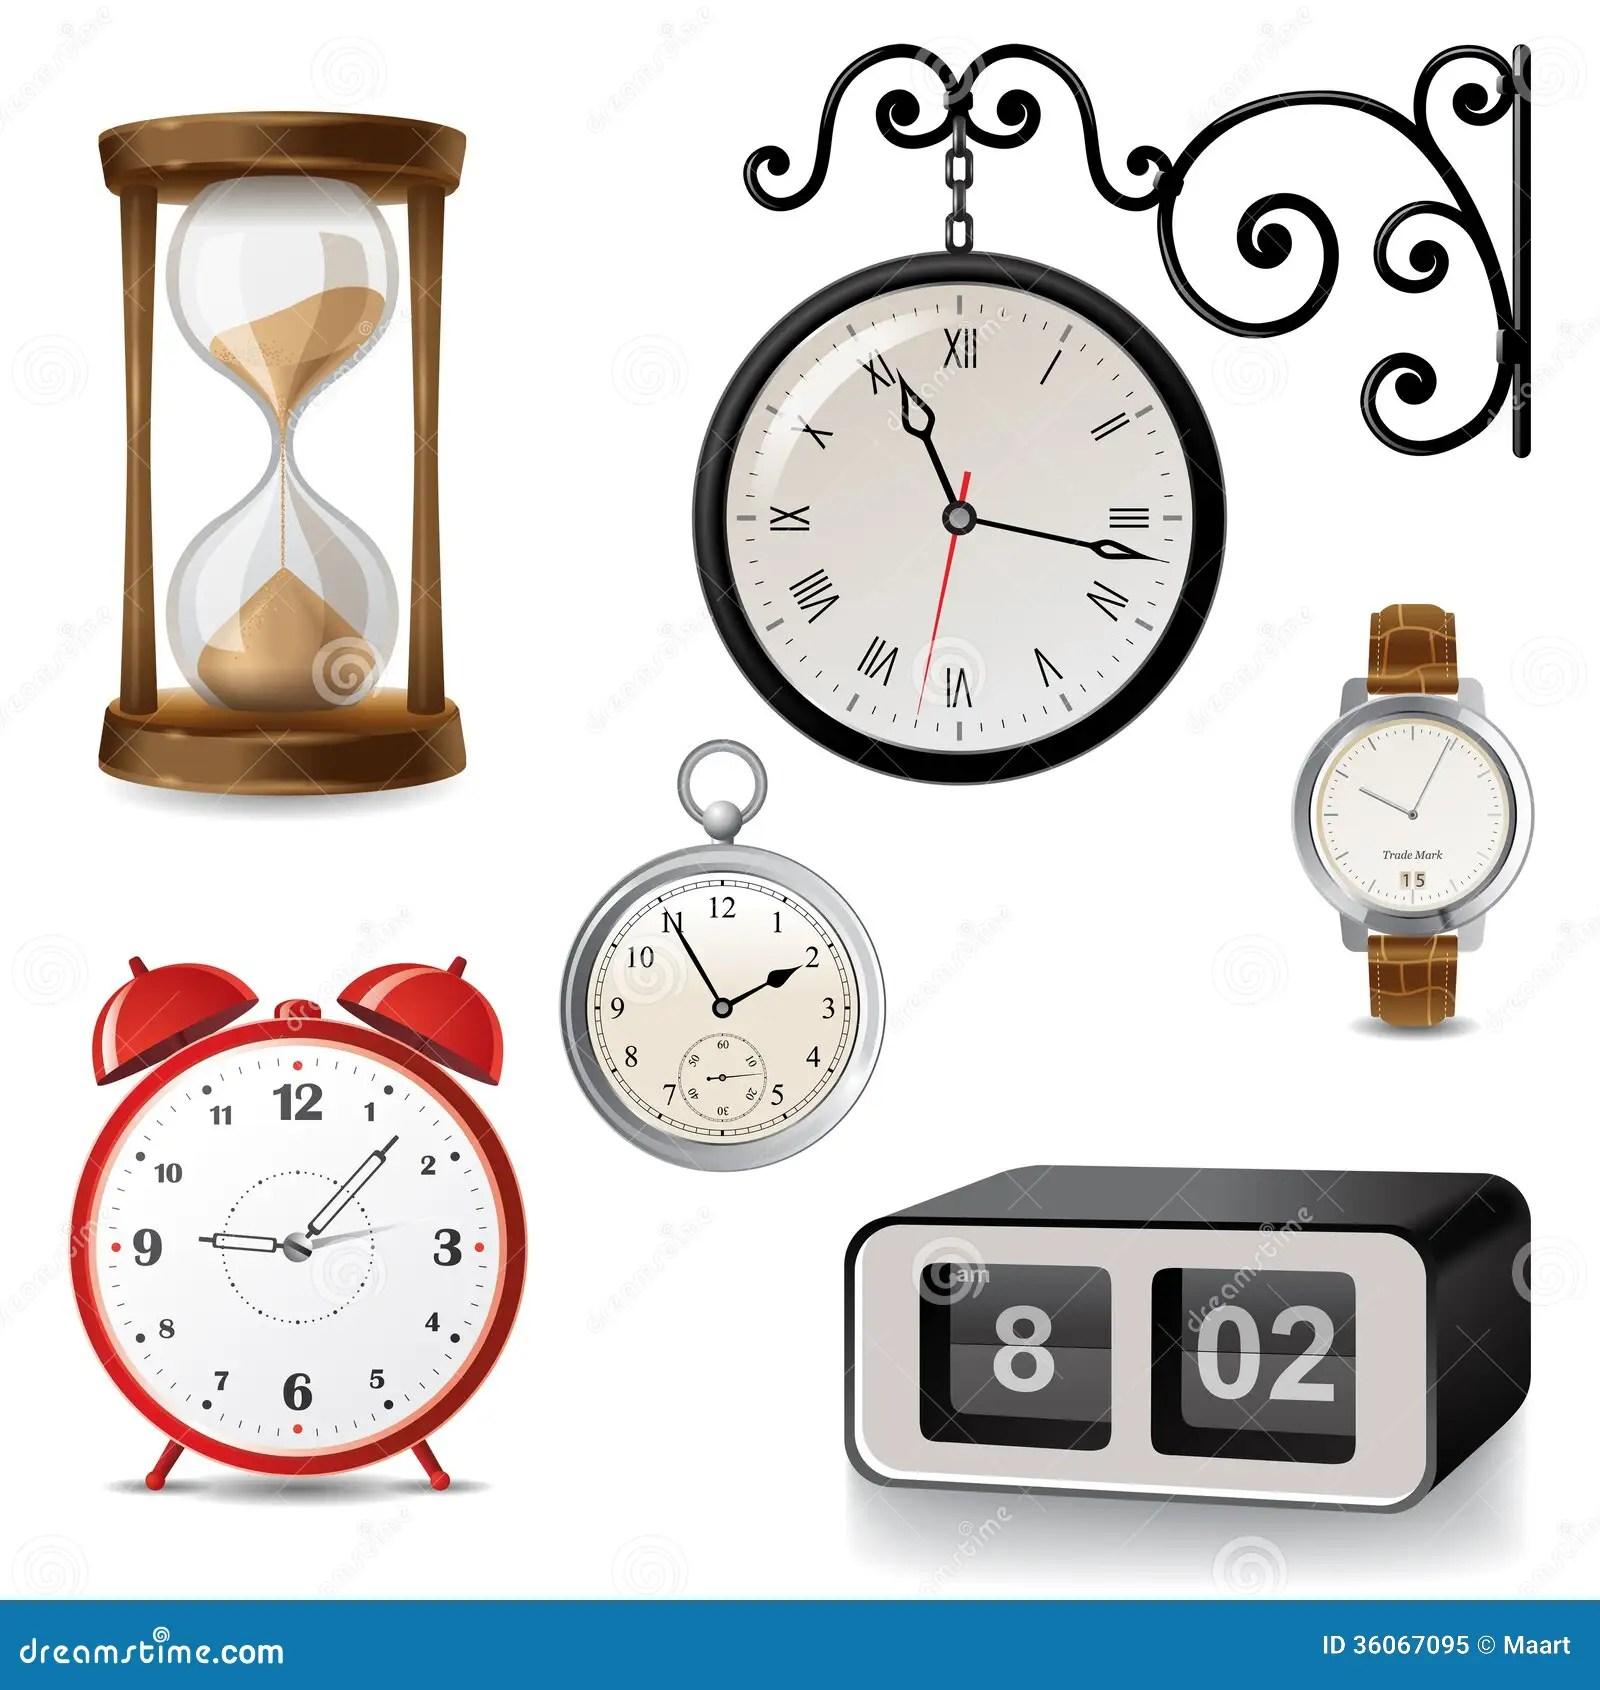 Types Of Clocks Worksheet